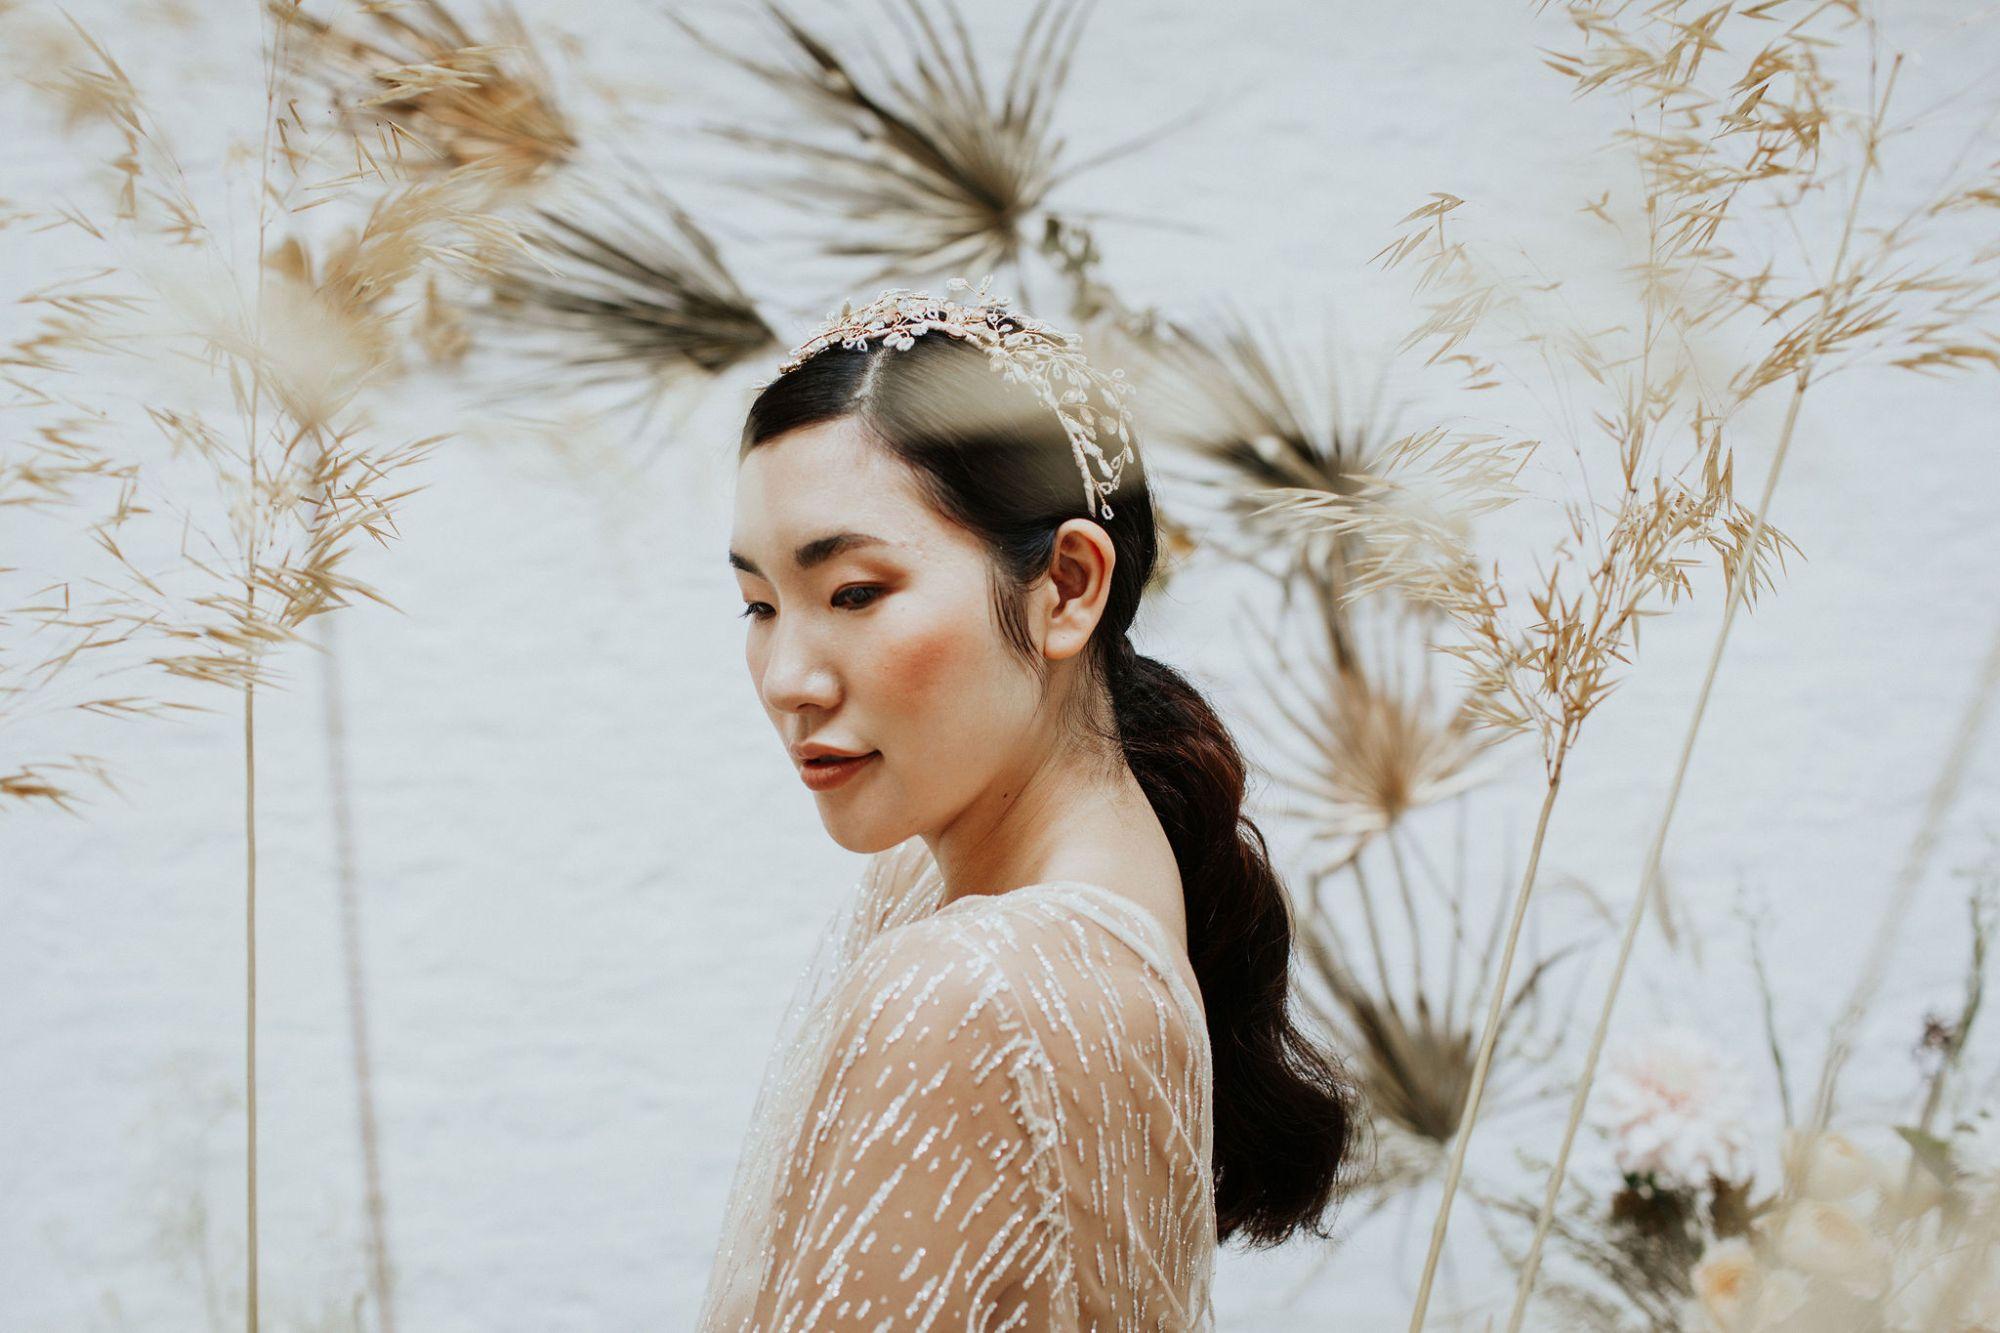 A model wears a delicate beaded bridal headdress handmade by Clare Lloyd Accessories